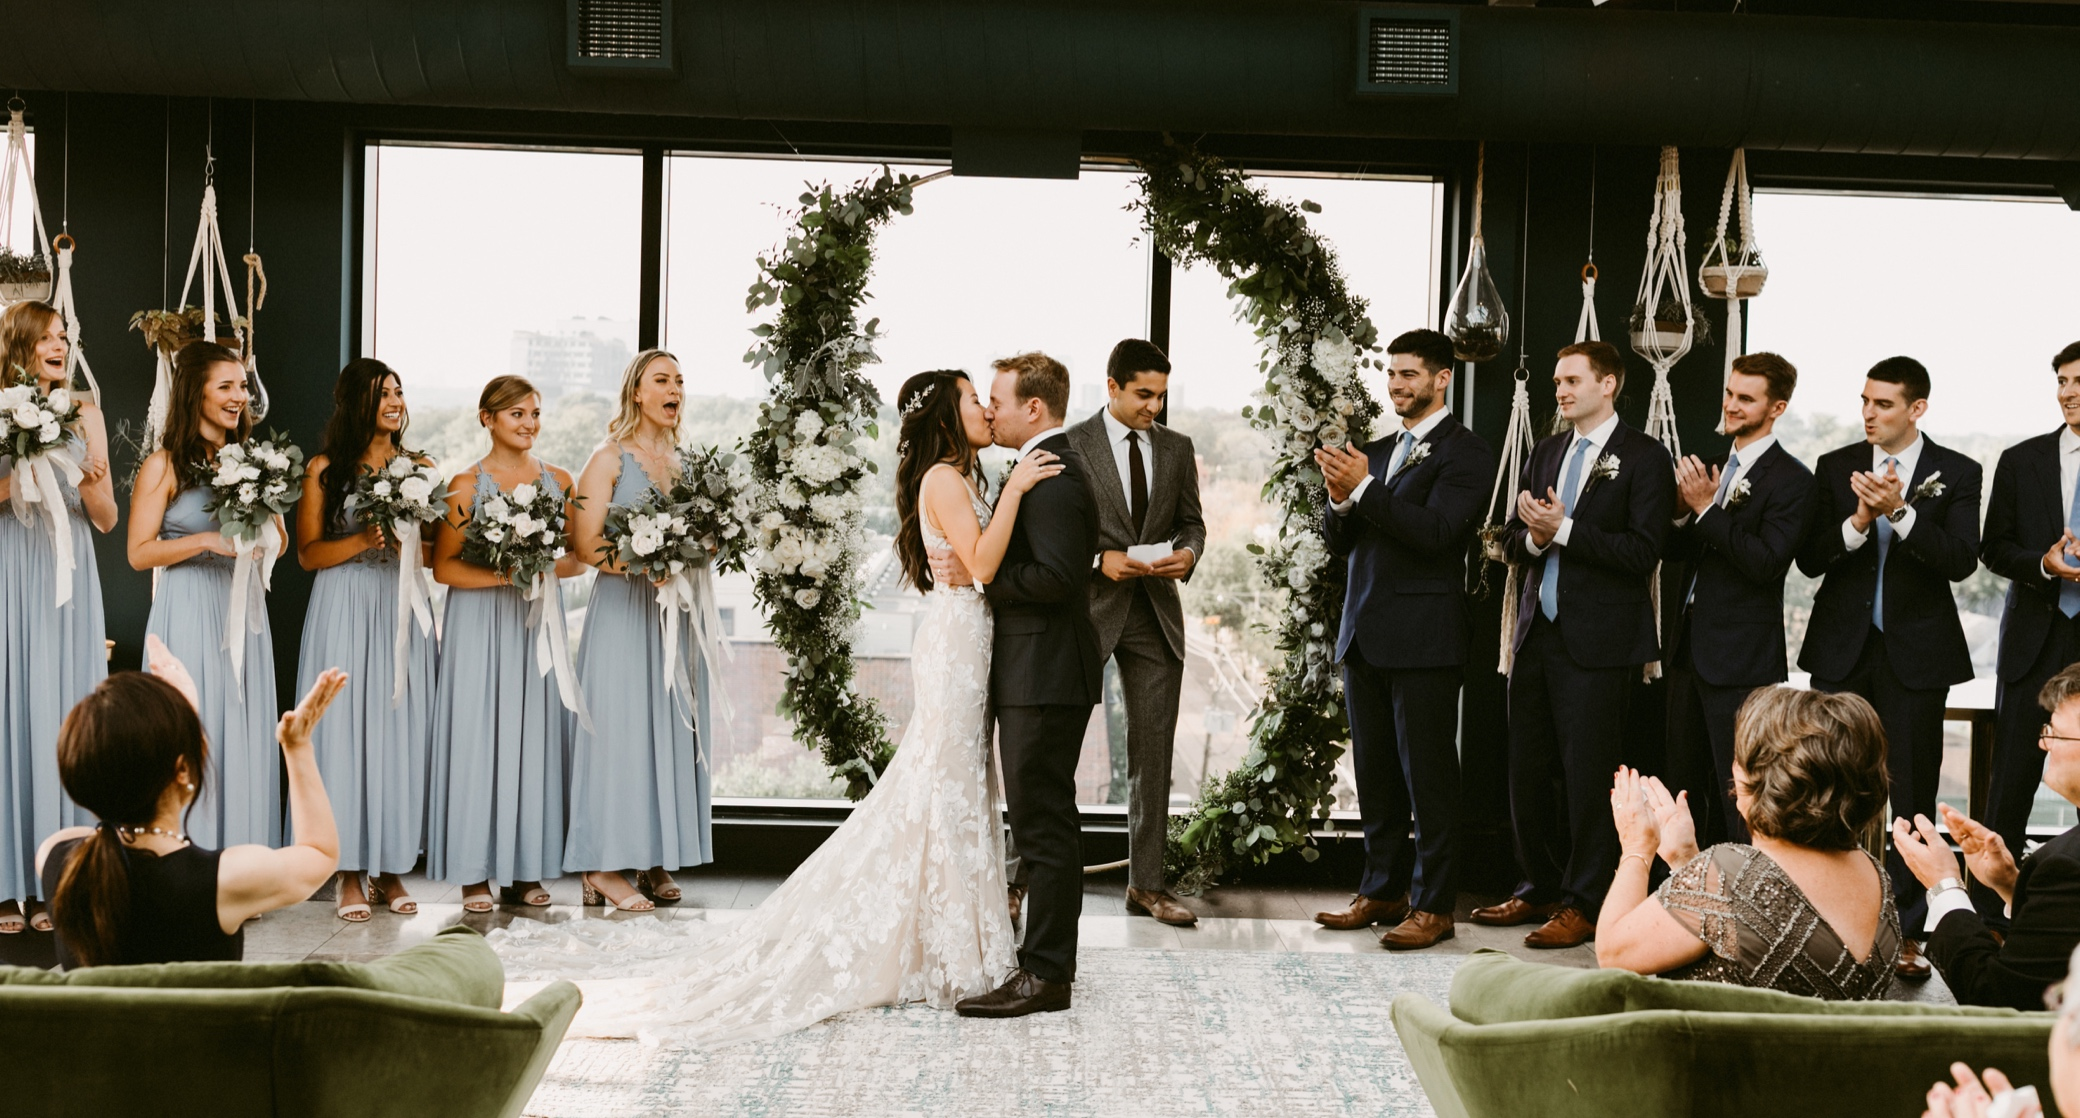 066_The Broadview Hotel Wedding (458 of 913).jpg